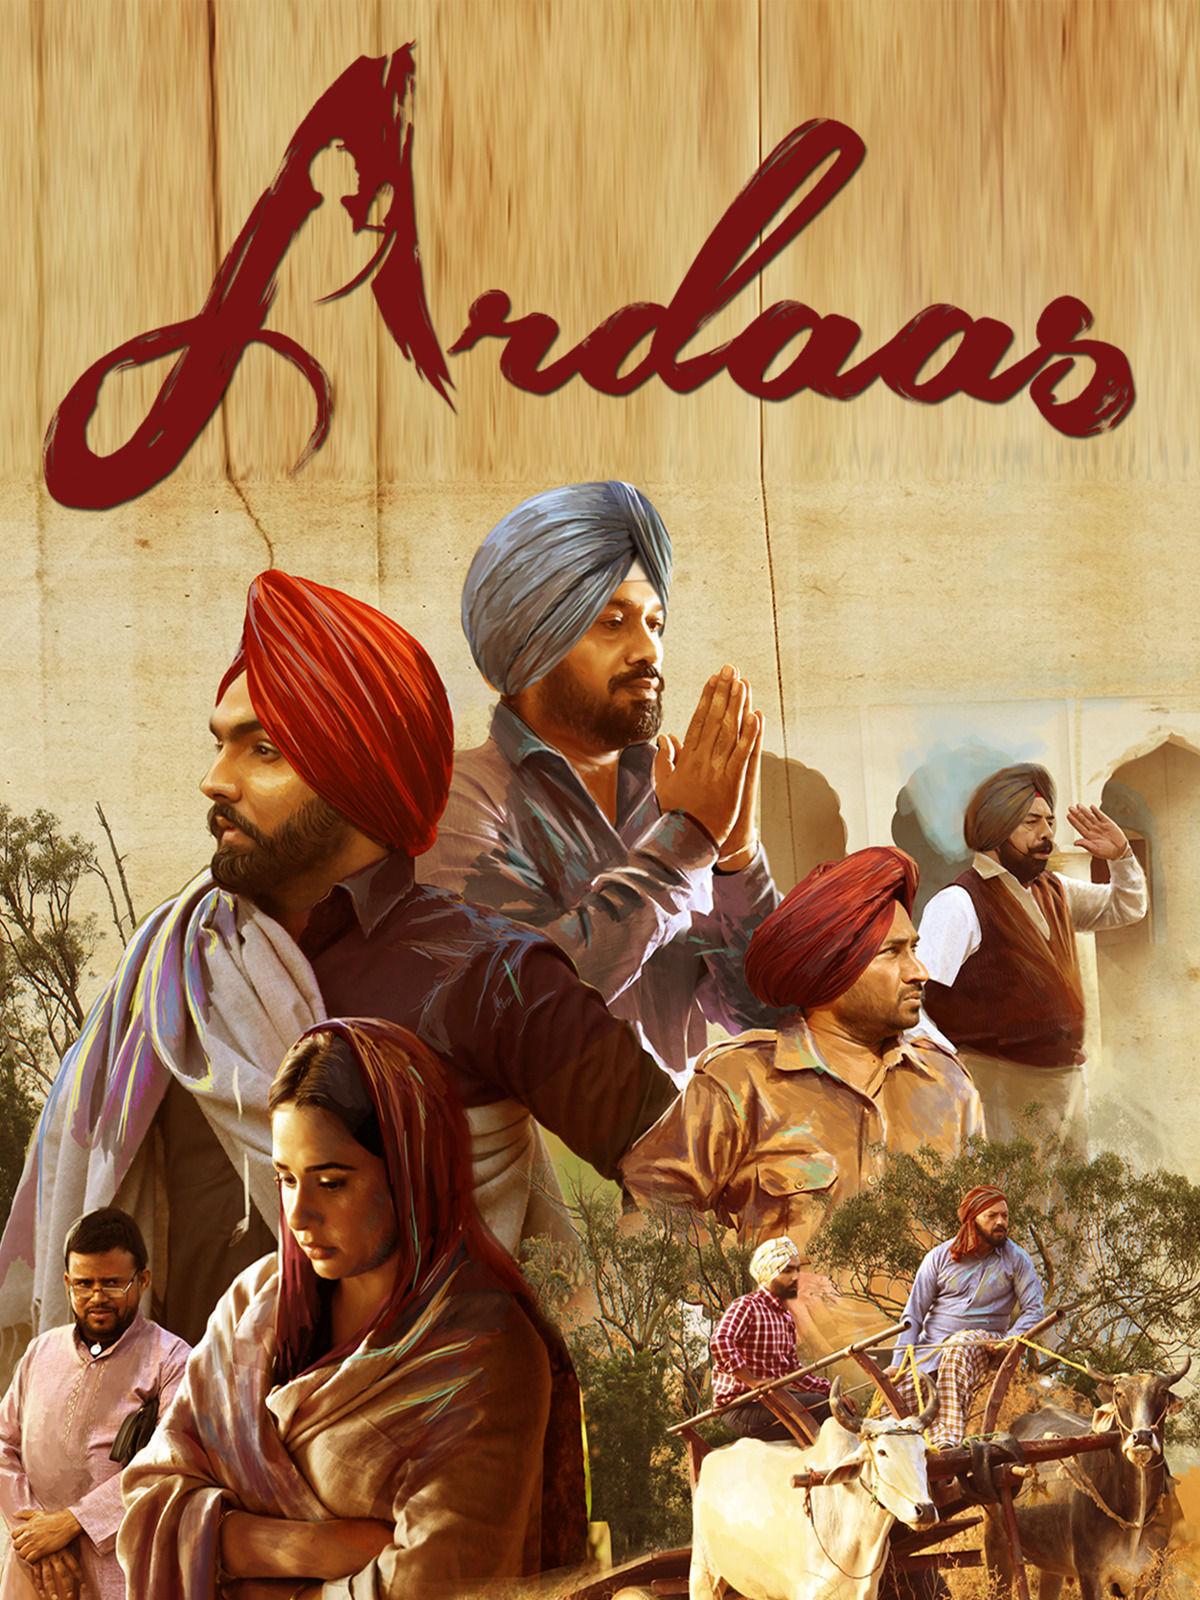 Satwant Kaur Best Movies, TV Shows and Web Series List